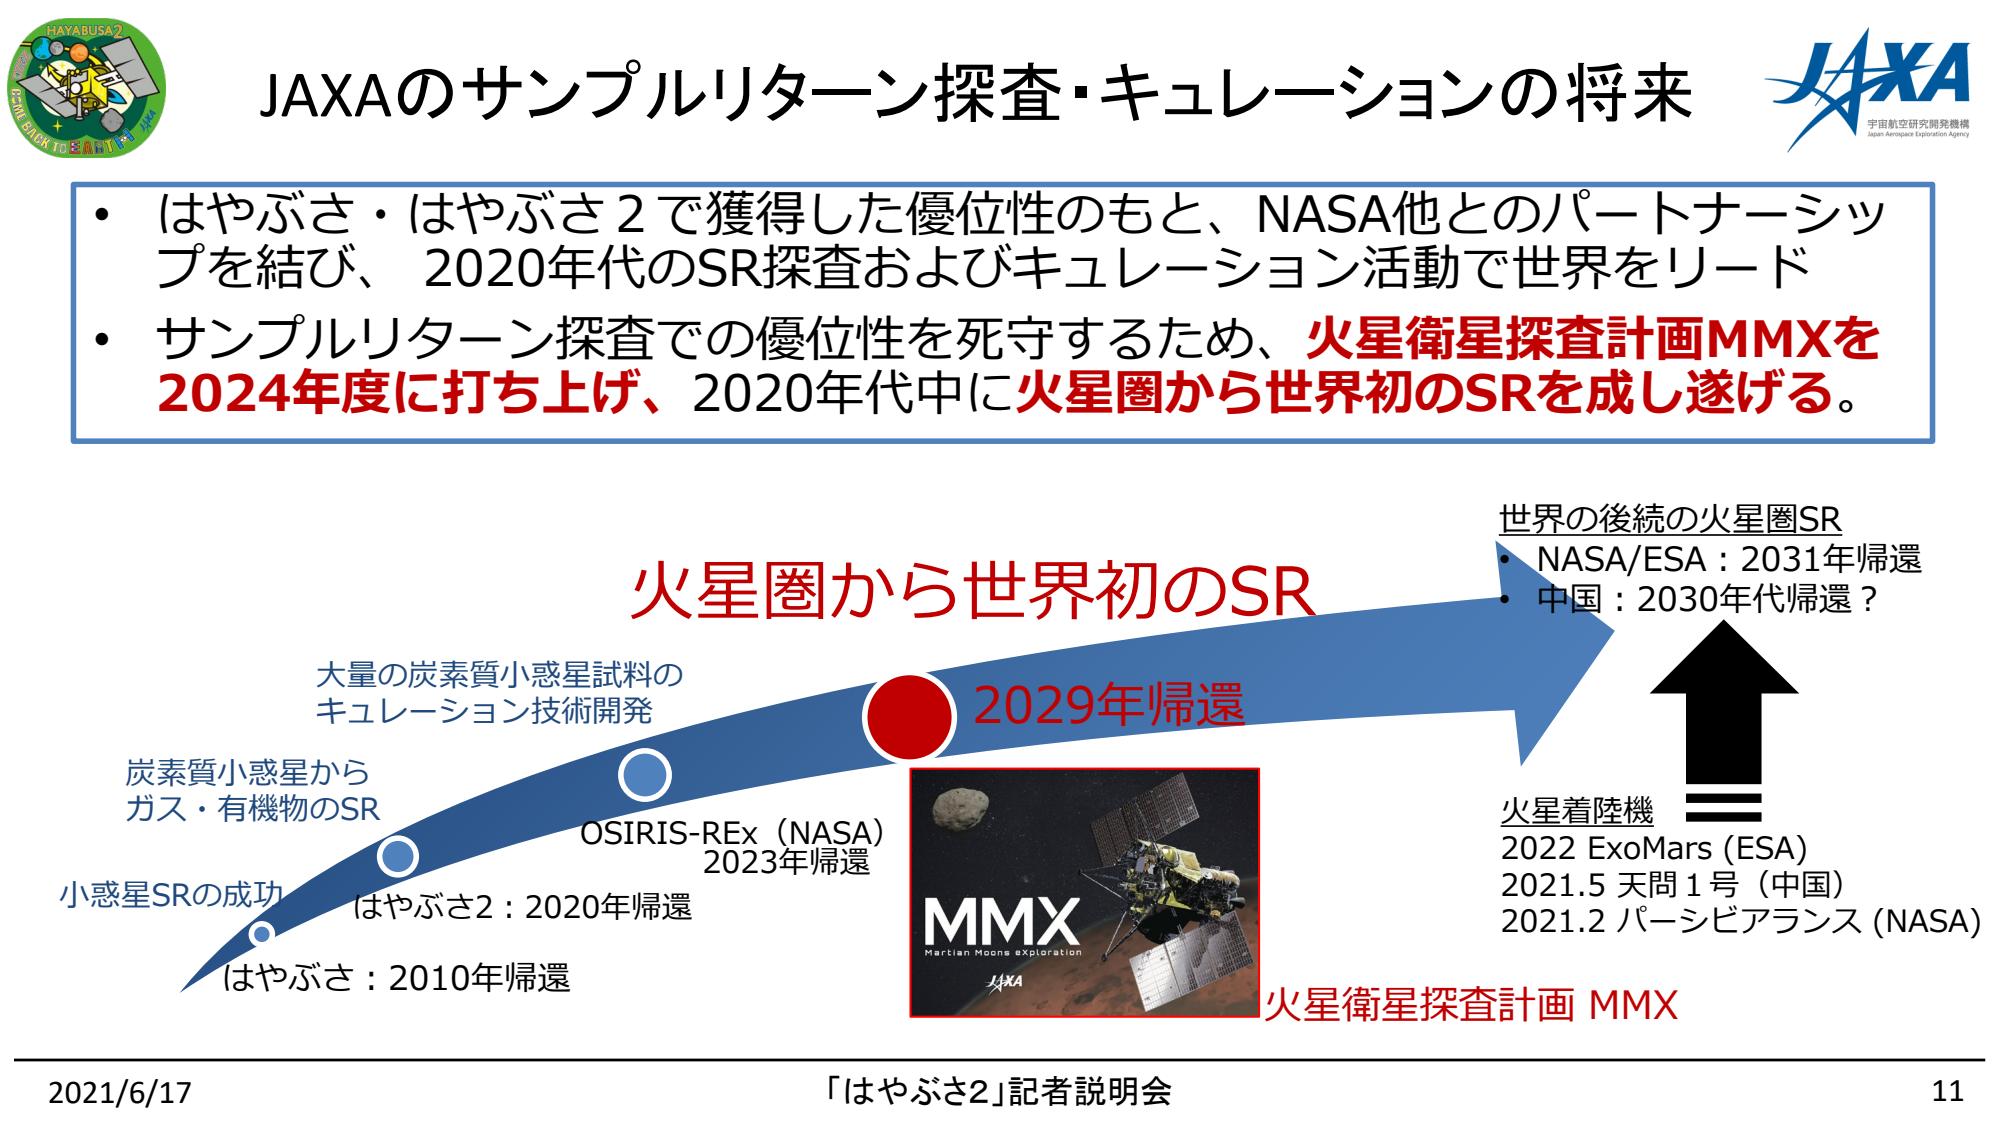 f:id:Imamura:20210617130221p:plain